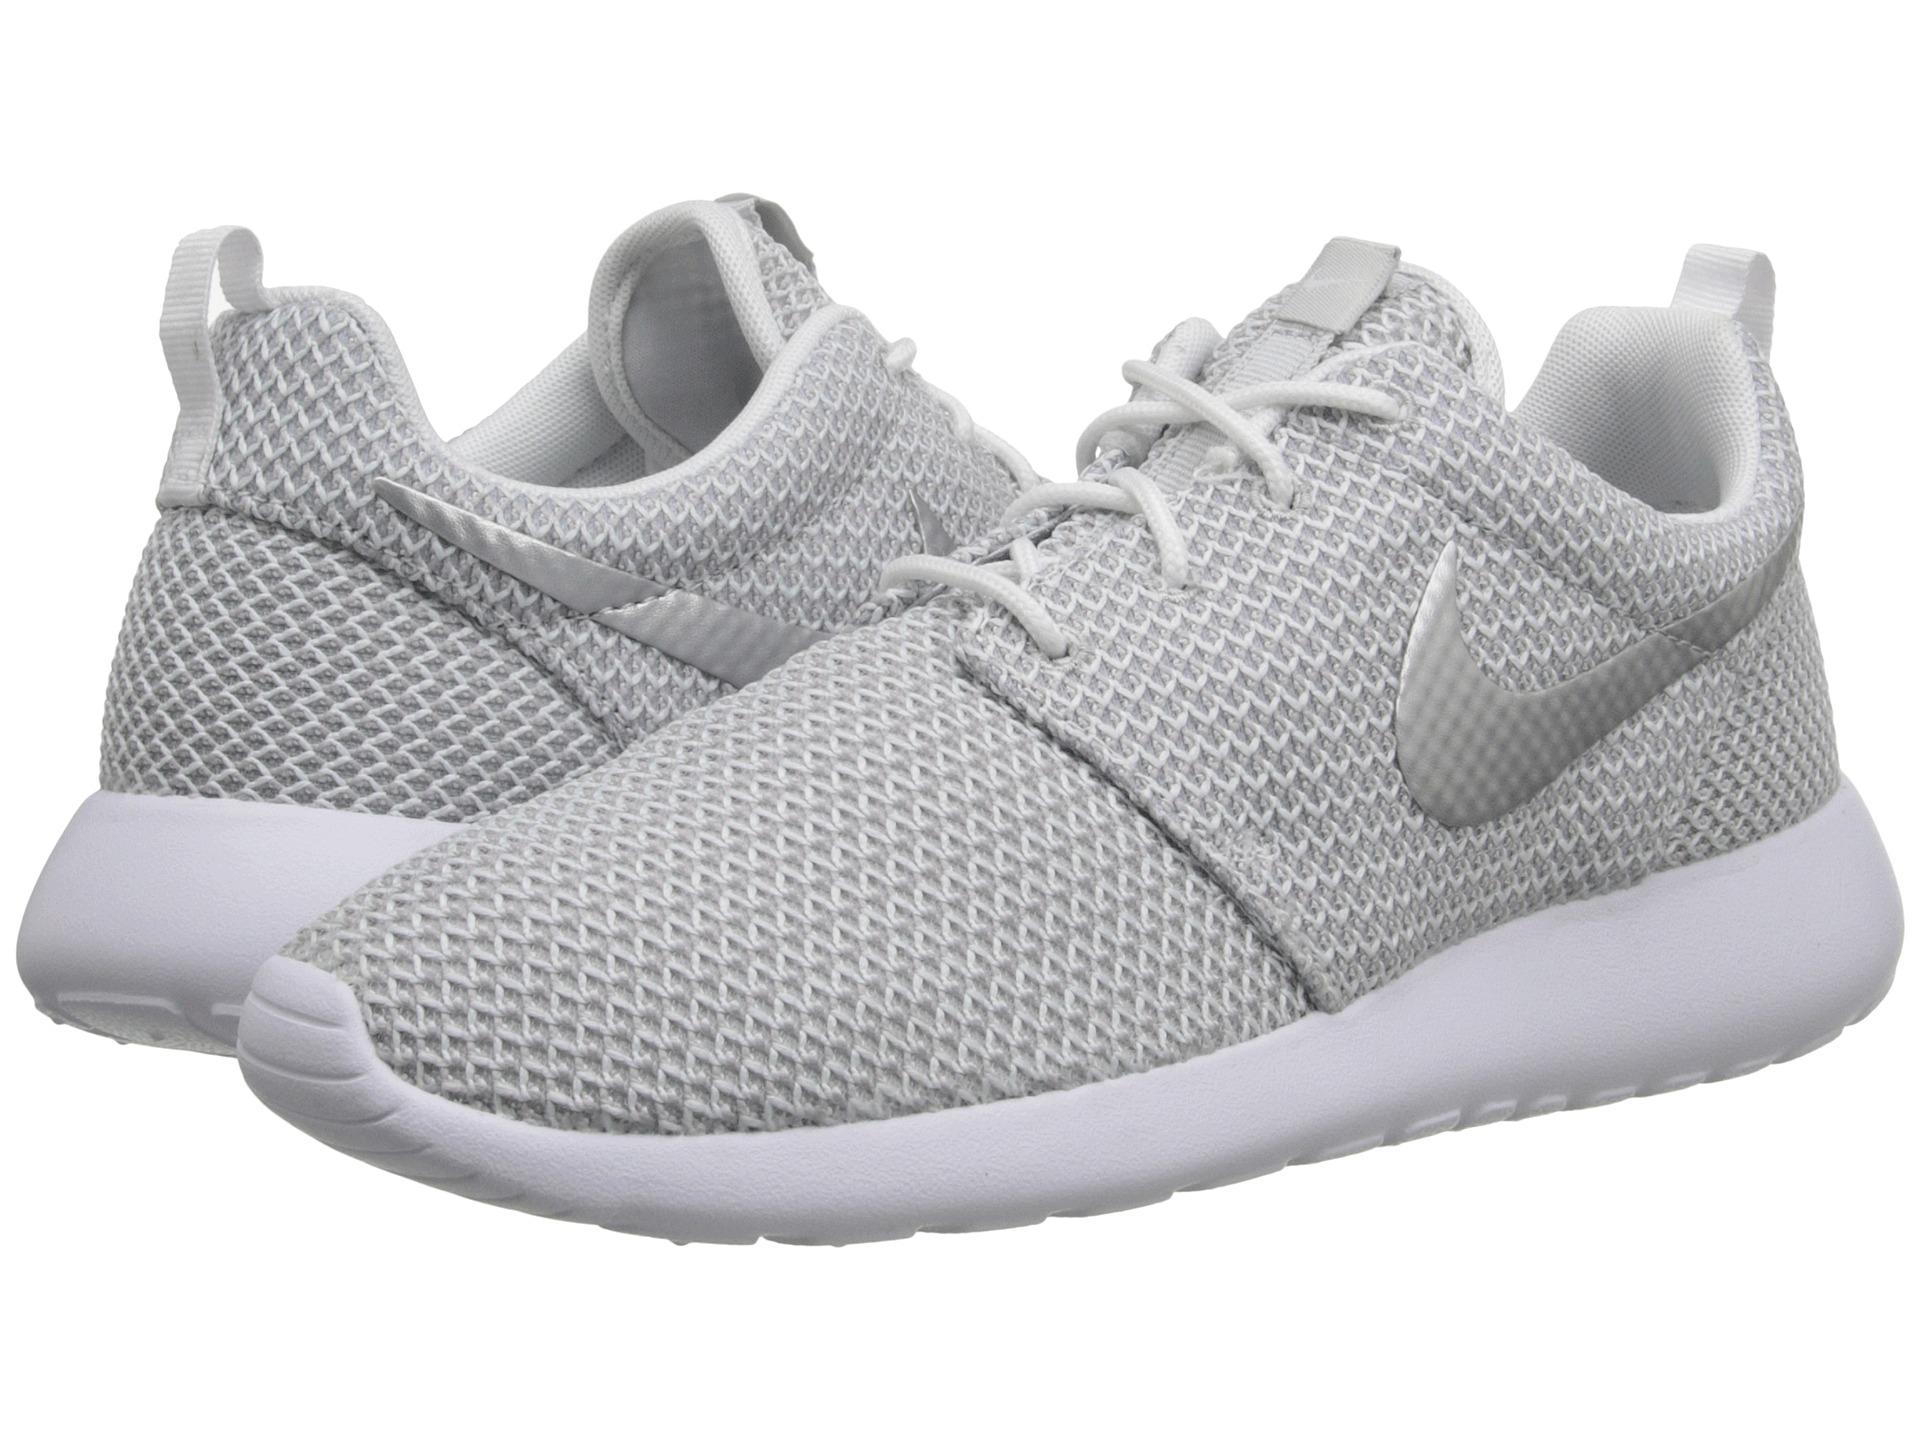 Lyst - Nike Roshe Run in Gray